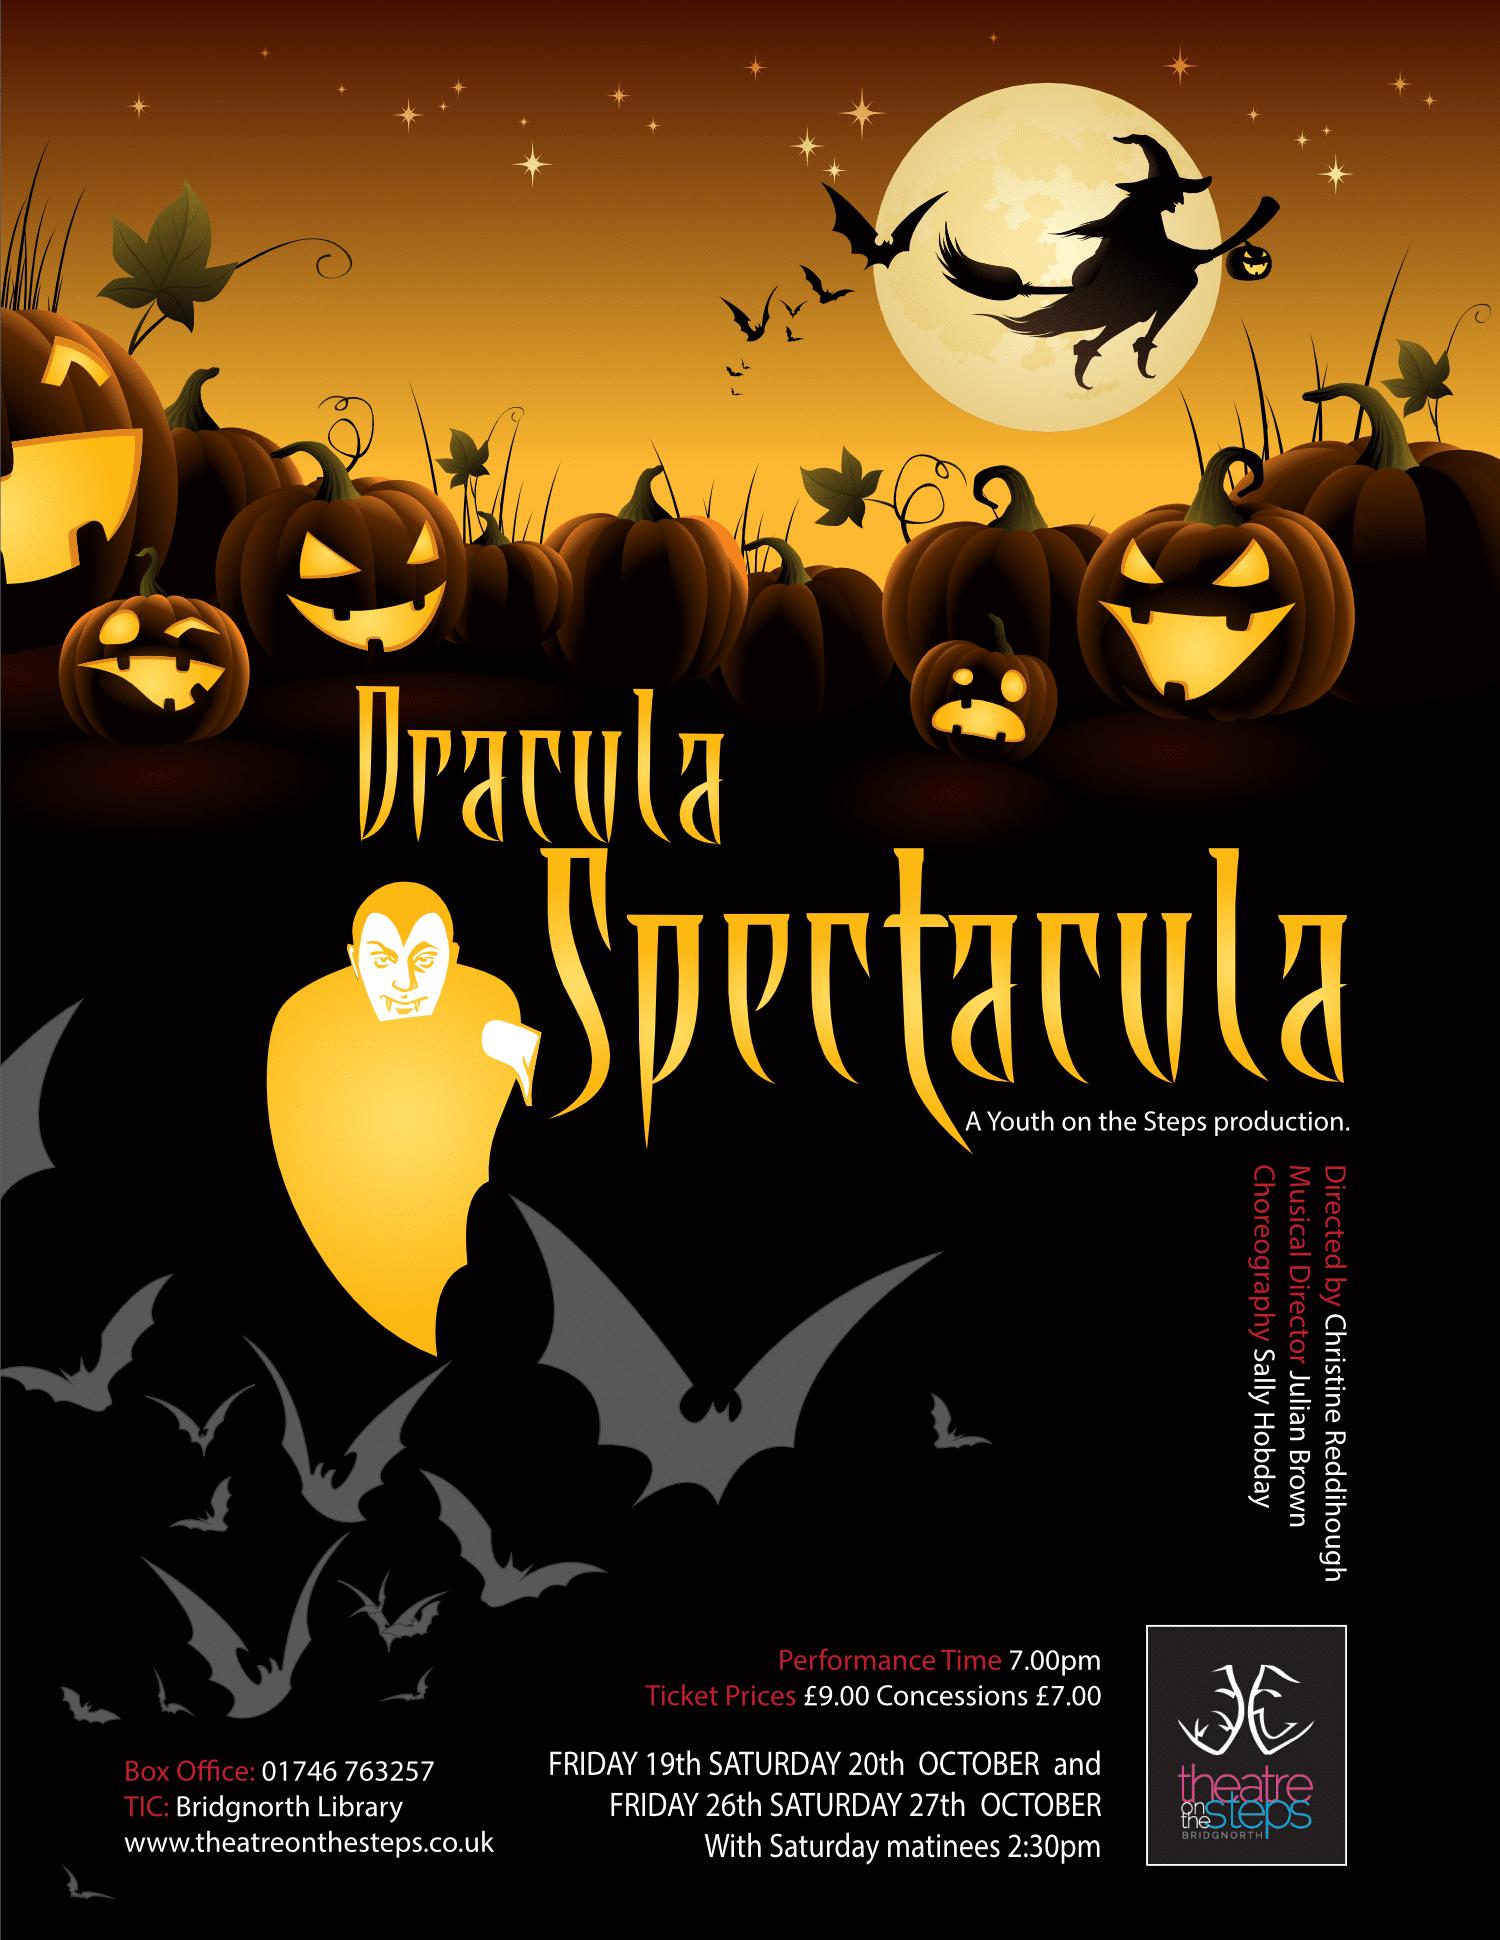 dracular spetacular_ad_A5